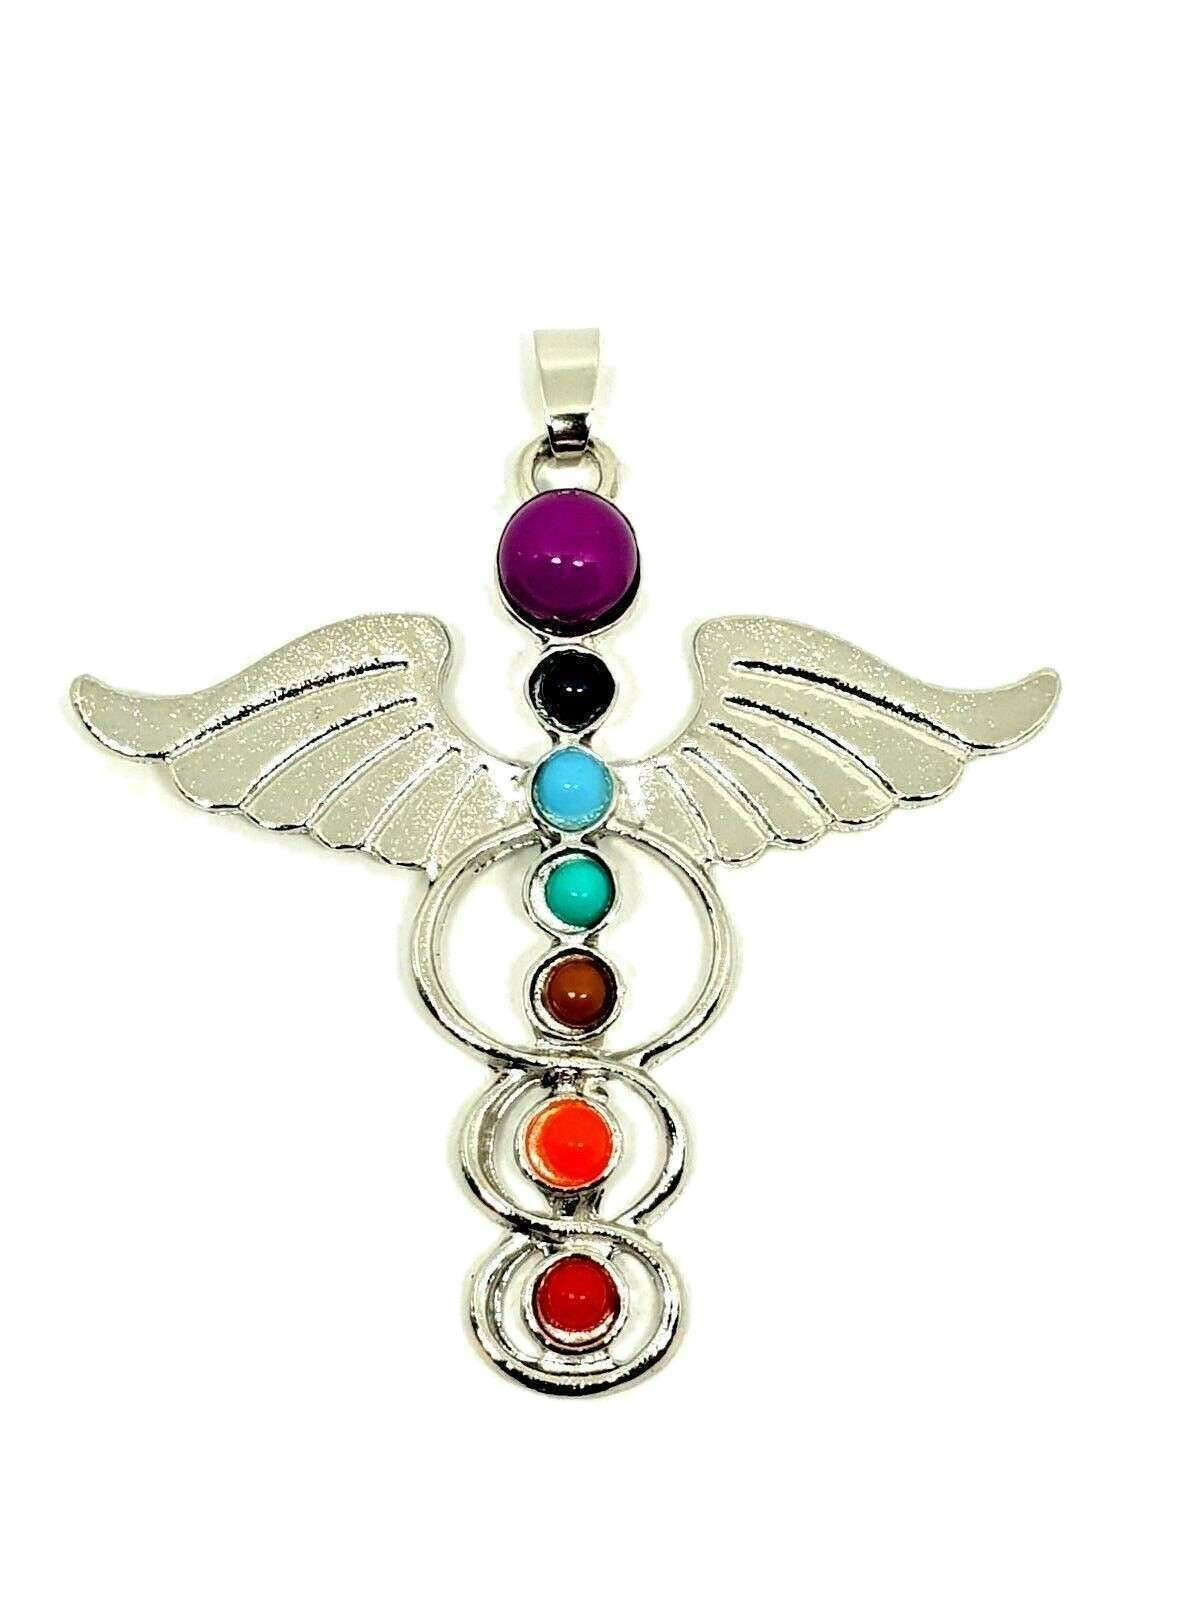 Hermes Winged Beautiful Chakra Silver Tone Guardian Angel Wing Pendant Gift image 4